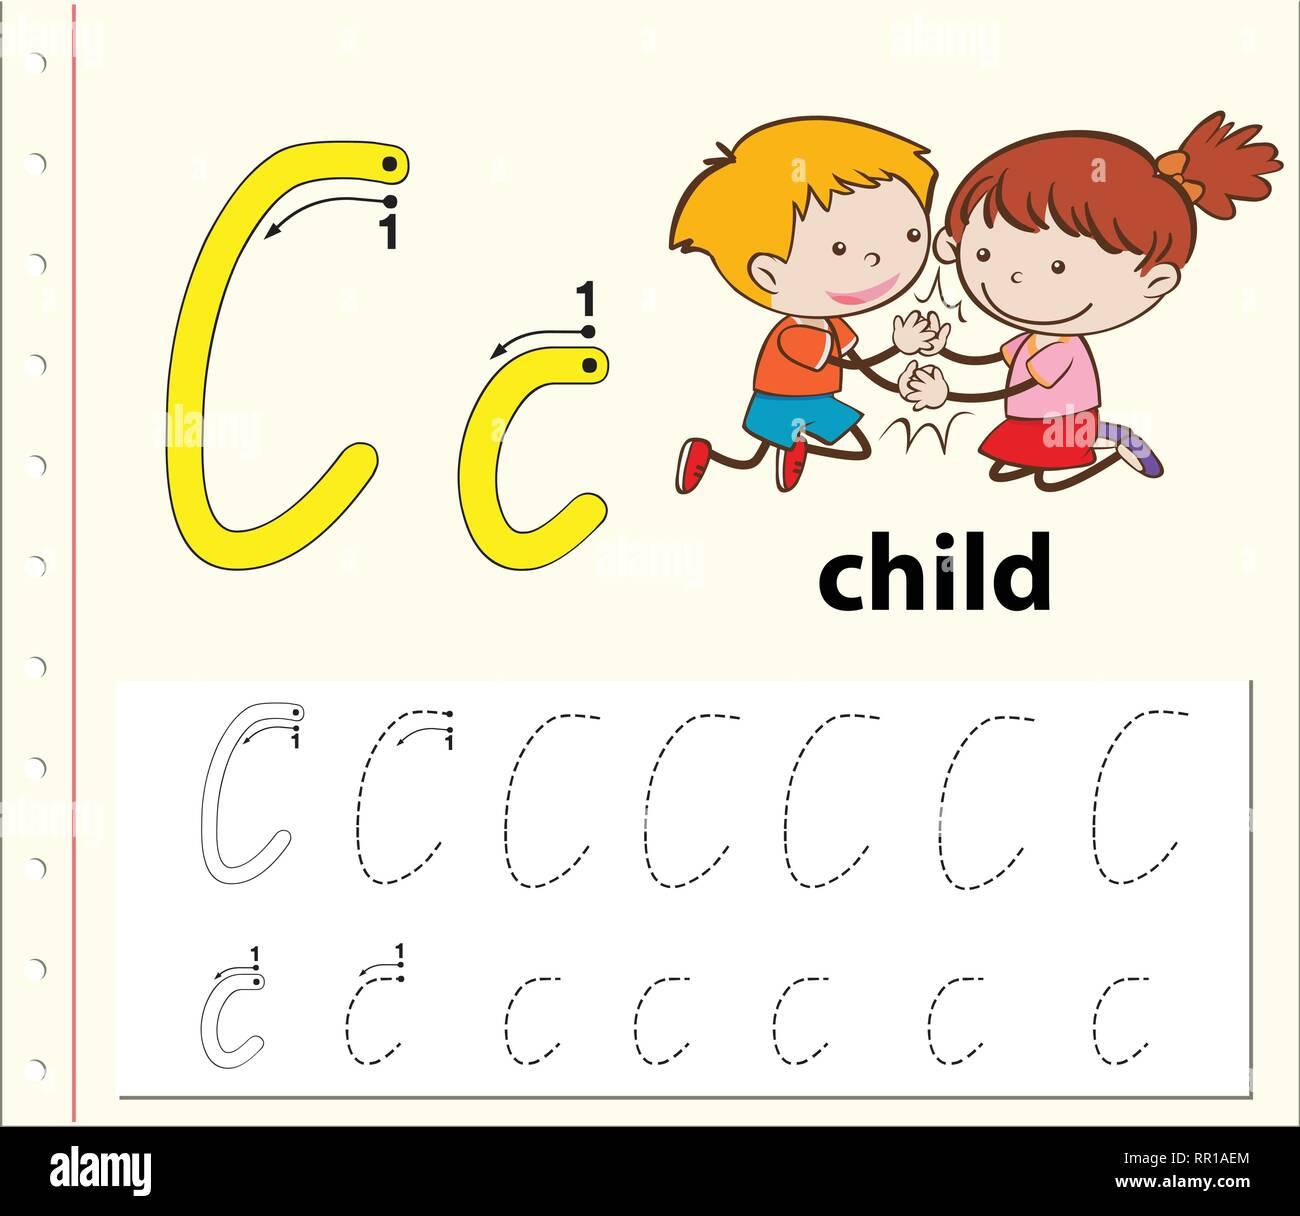 Letter C Tracing Alphabet Worksheets Illustration Stock